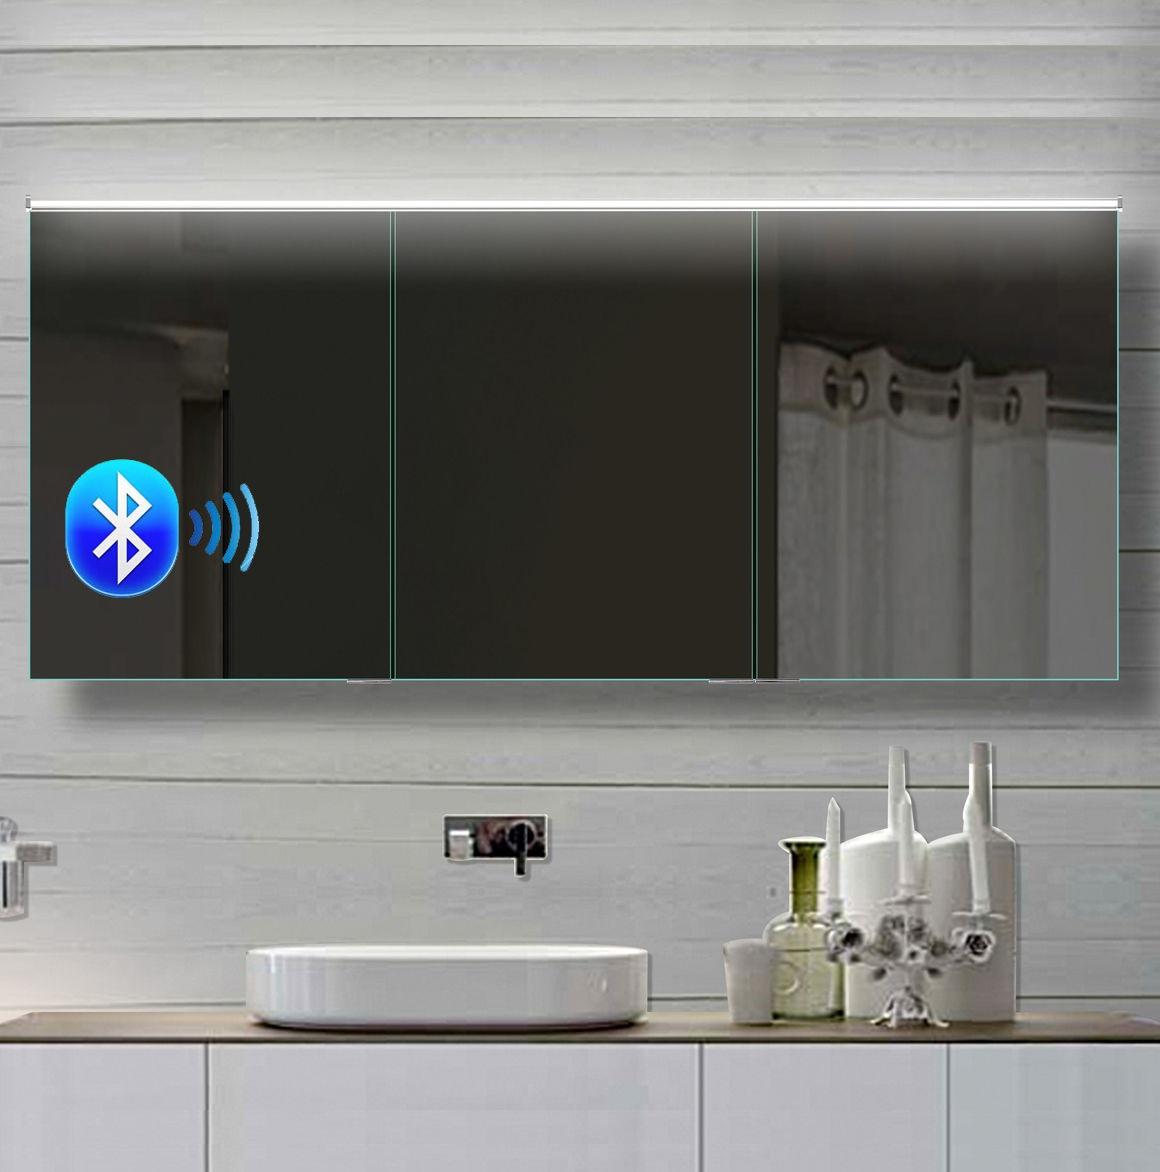 LED Spiegelschrank 17x17 cm, Bluetooth Kaltweiss / Warmweiss Bad